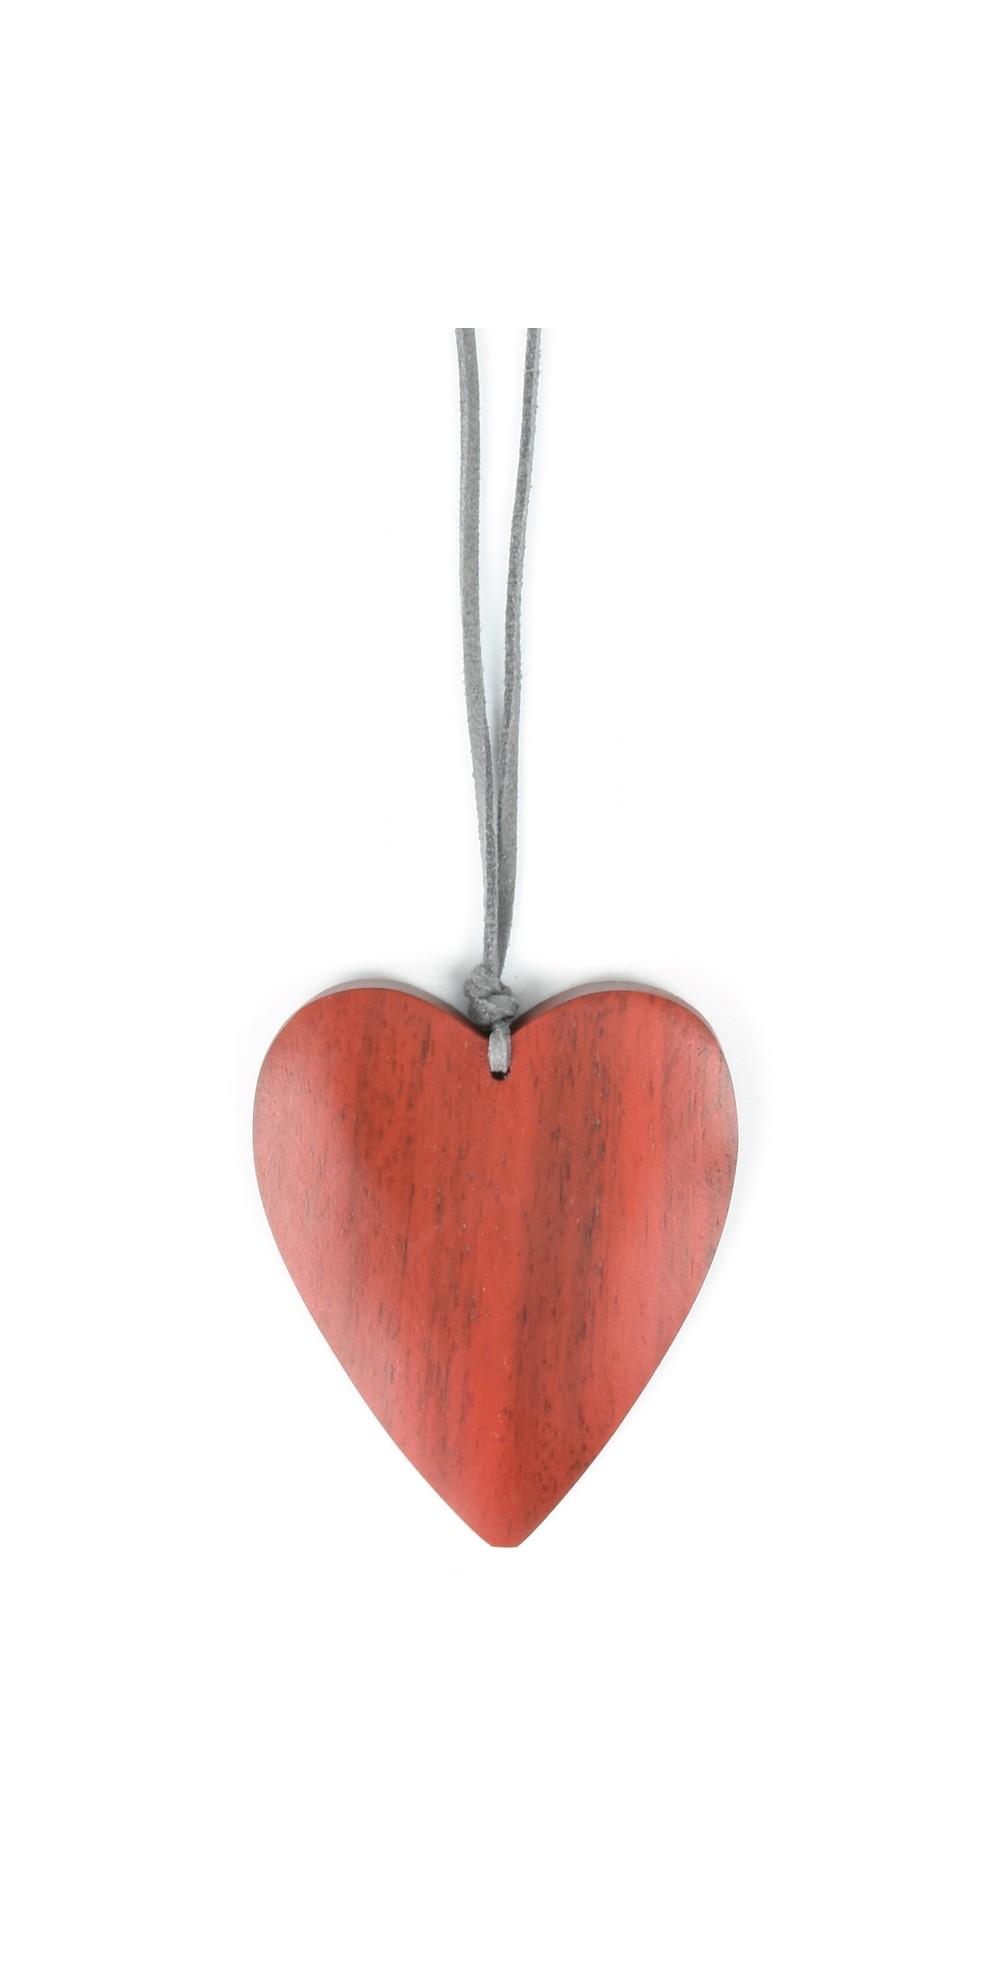 Suzie Blue Teal Blue Wooden Heart Necklace